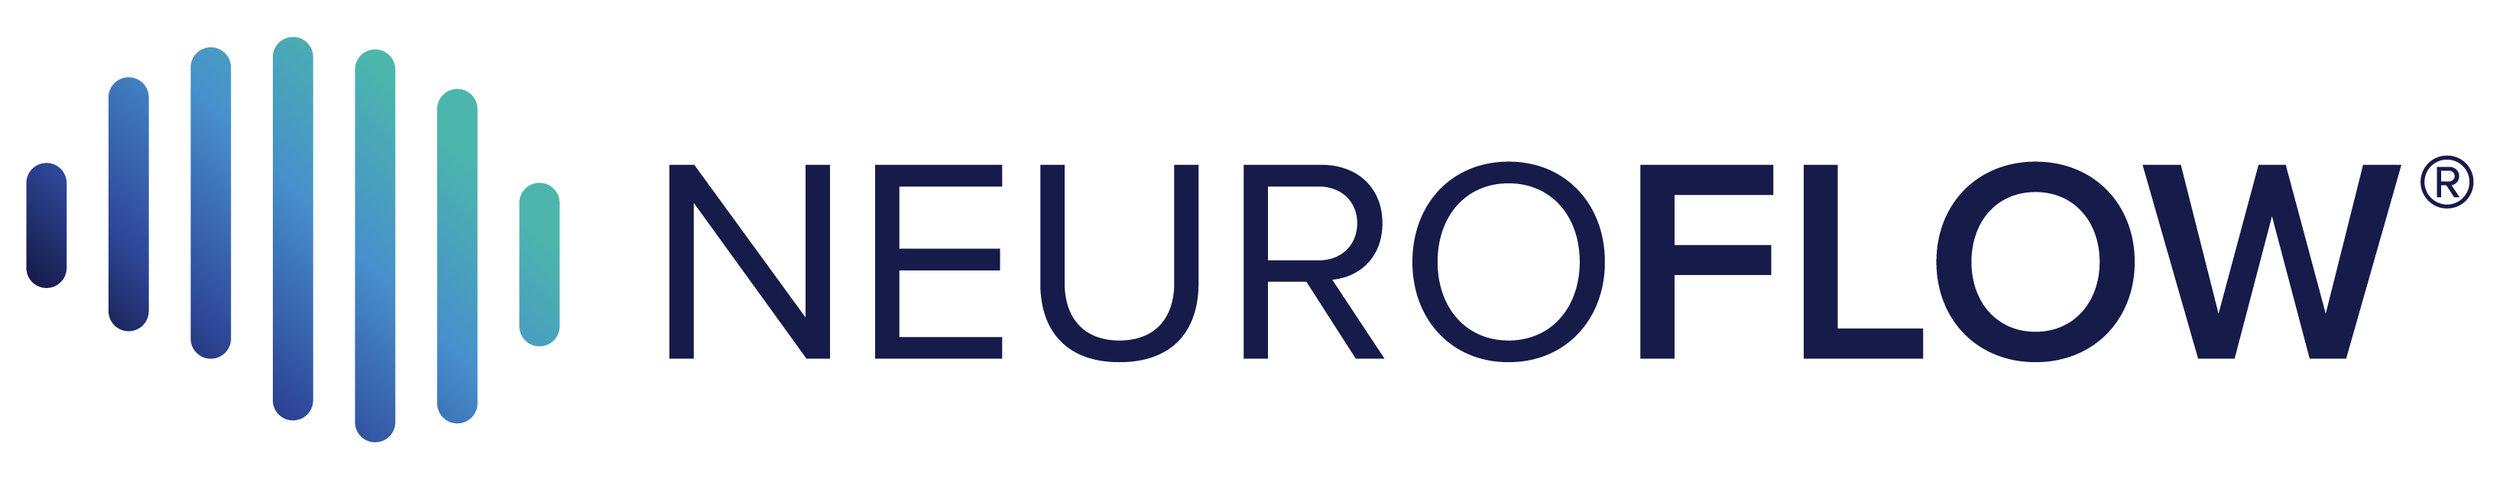 NeuroFlow-Logo-RGB-Full.jpg